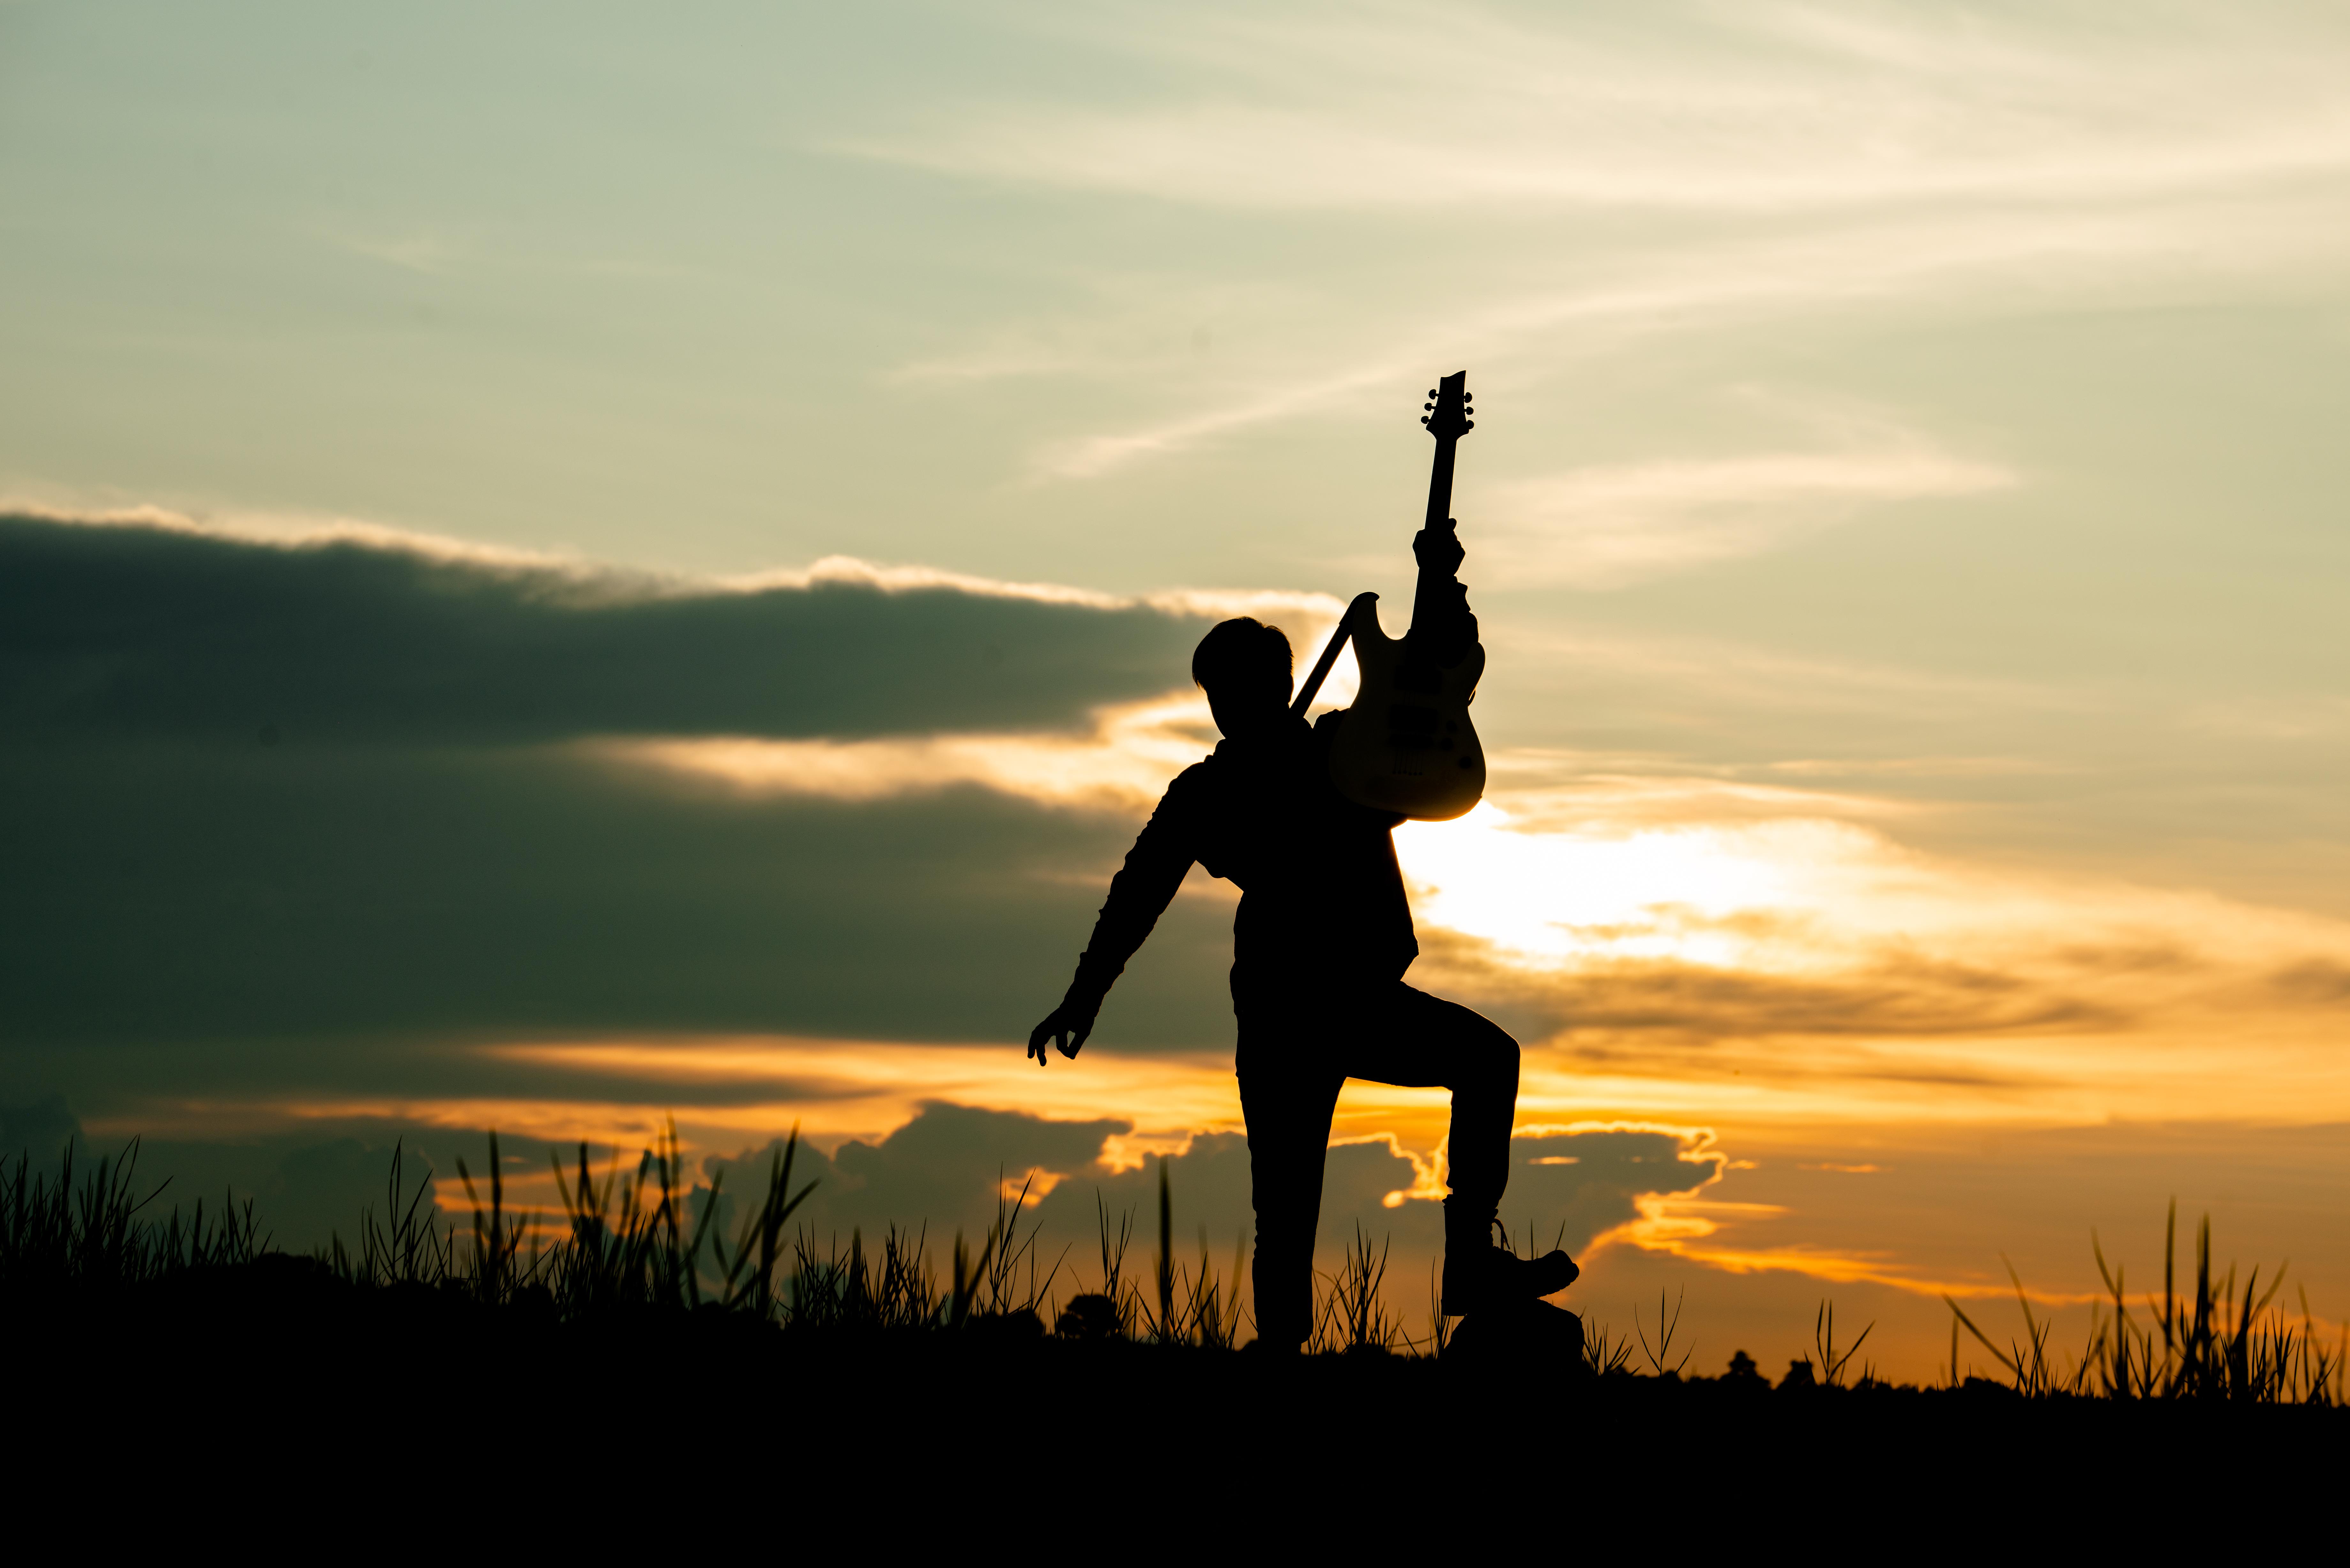 Young musician playing guitar